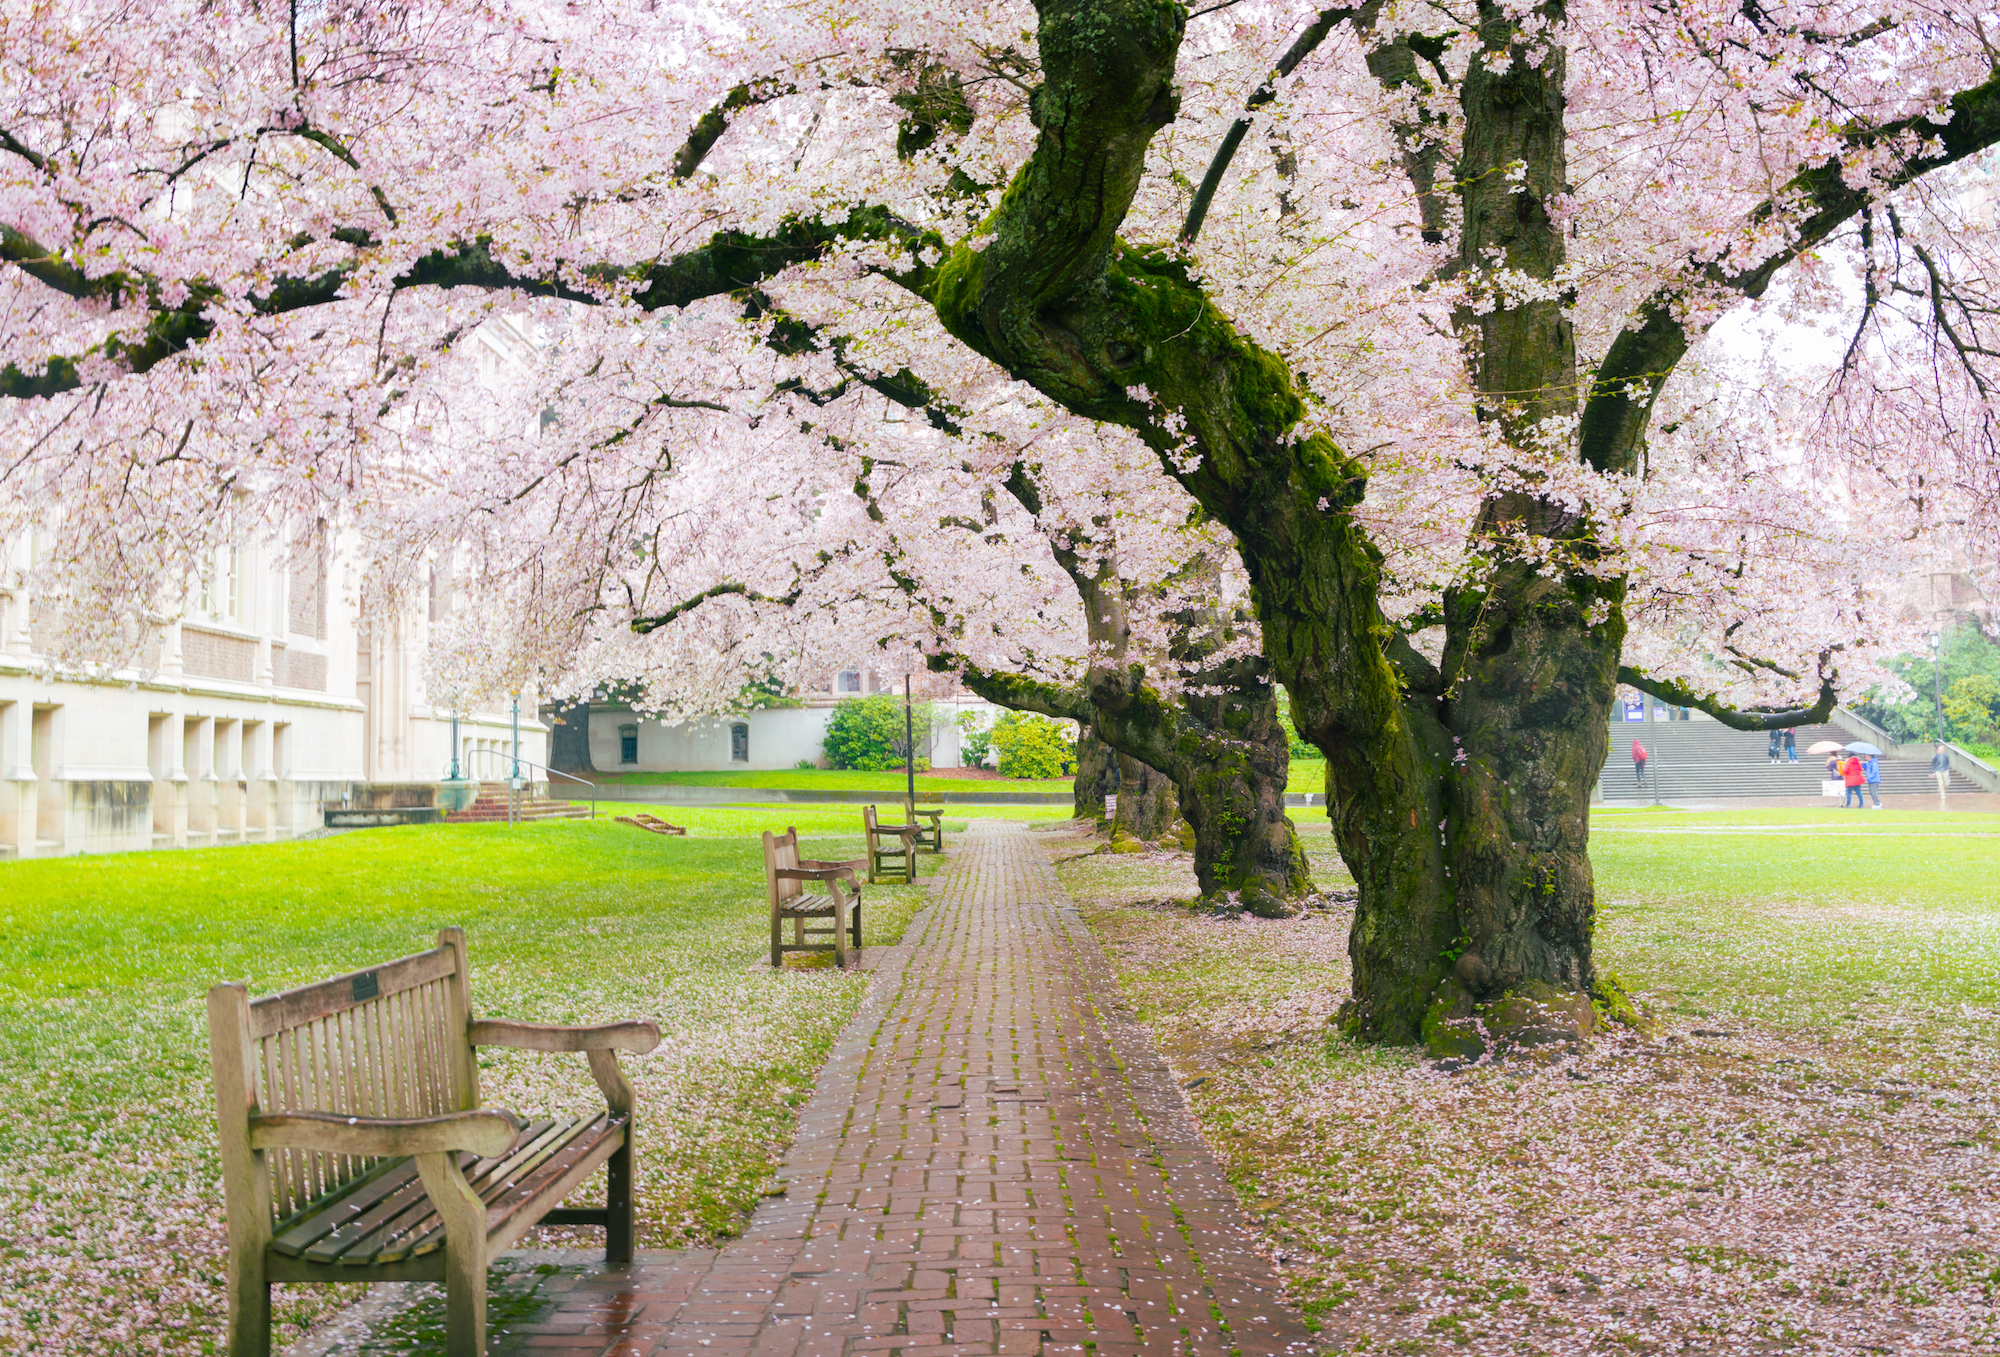 Seattle cherry blossoms, University of Washington